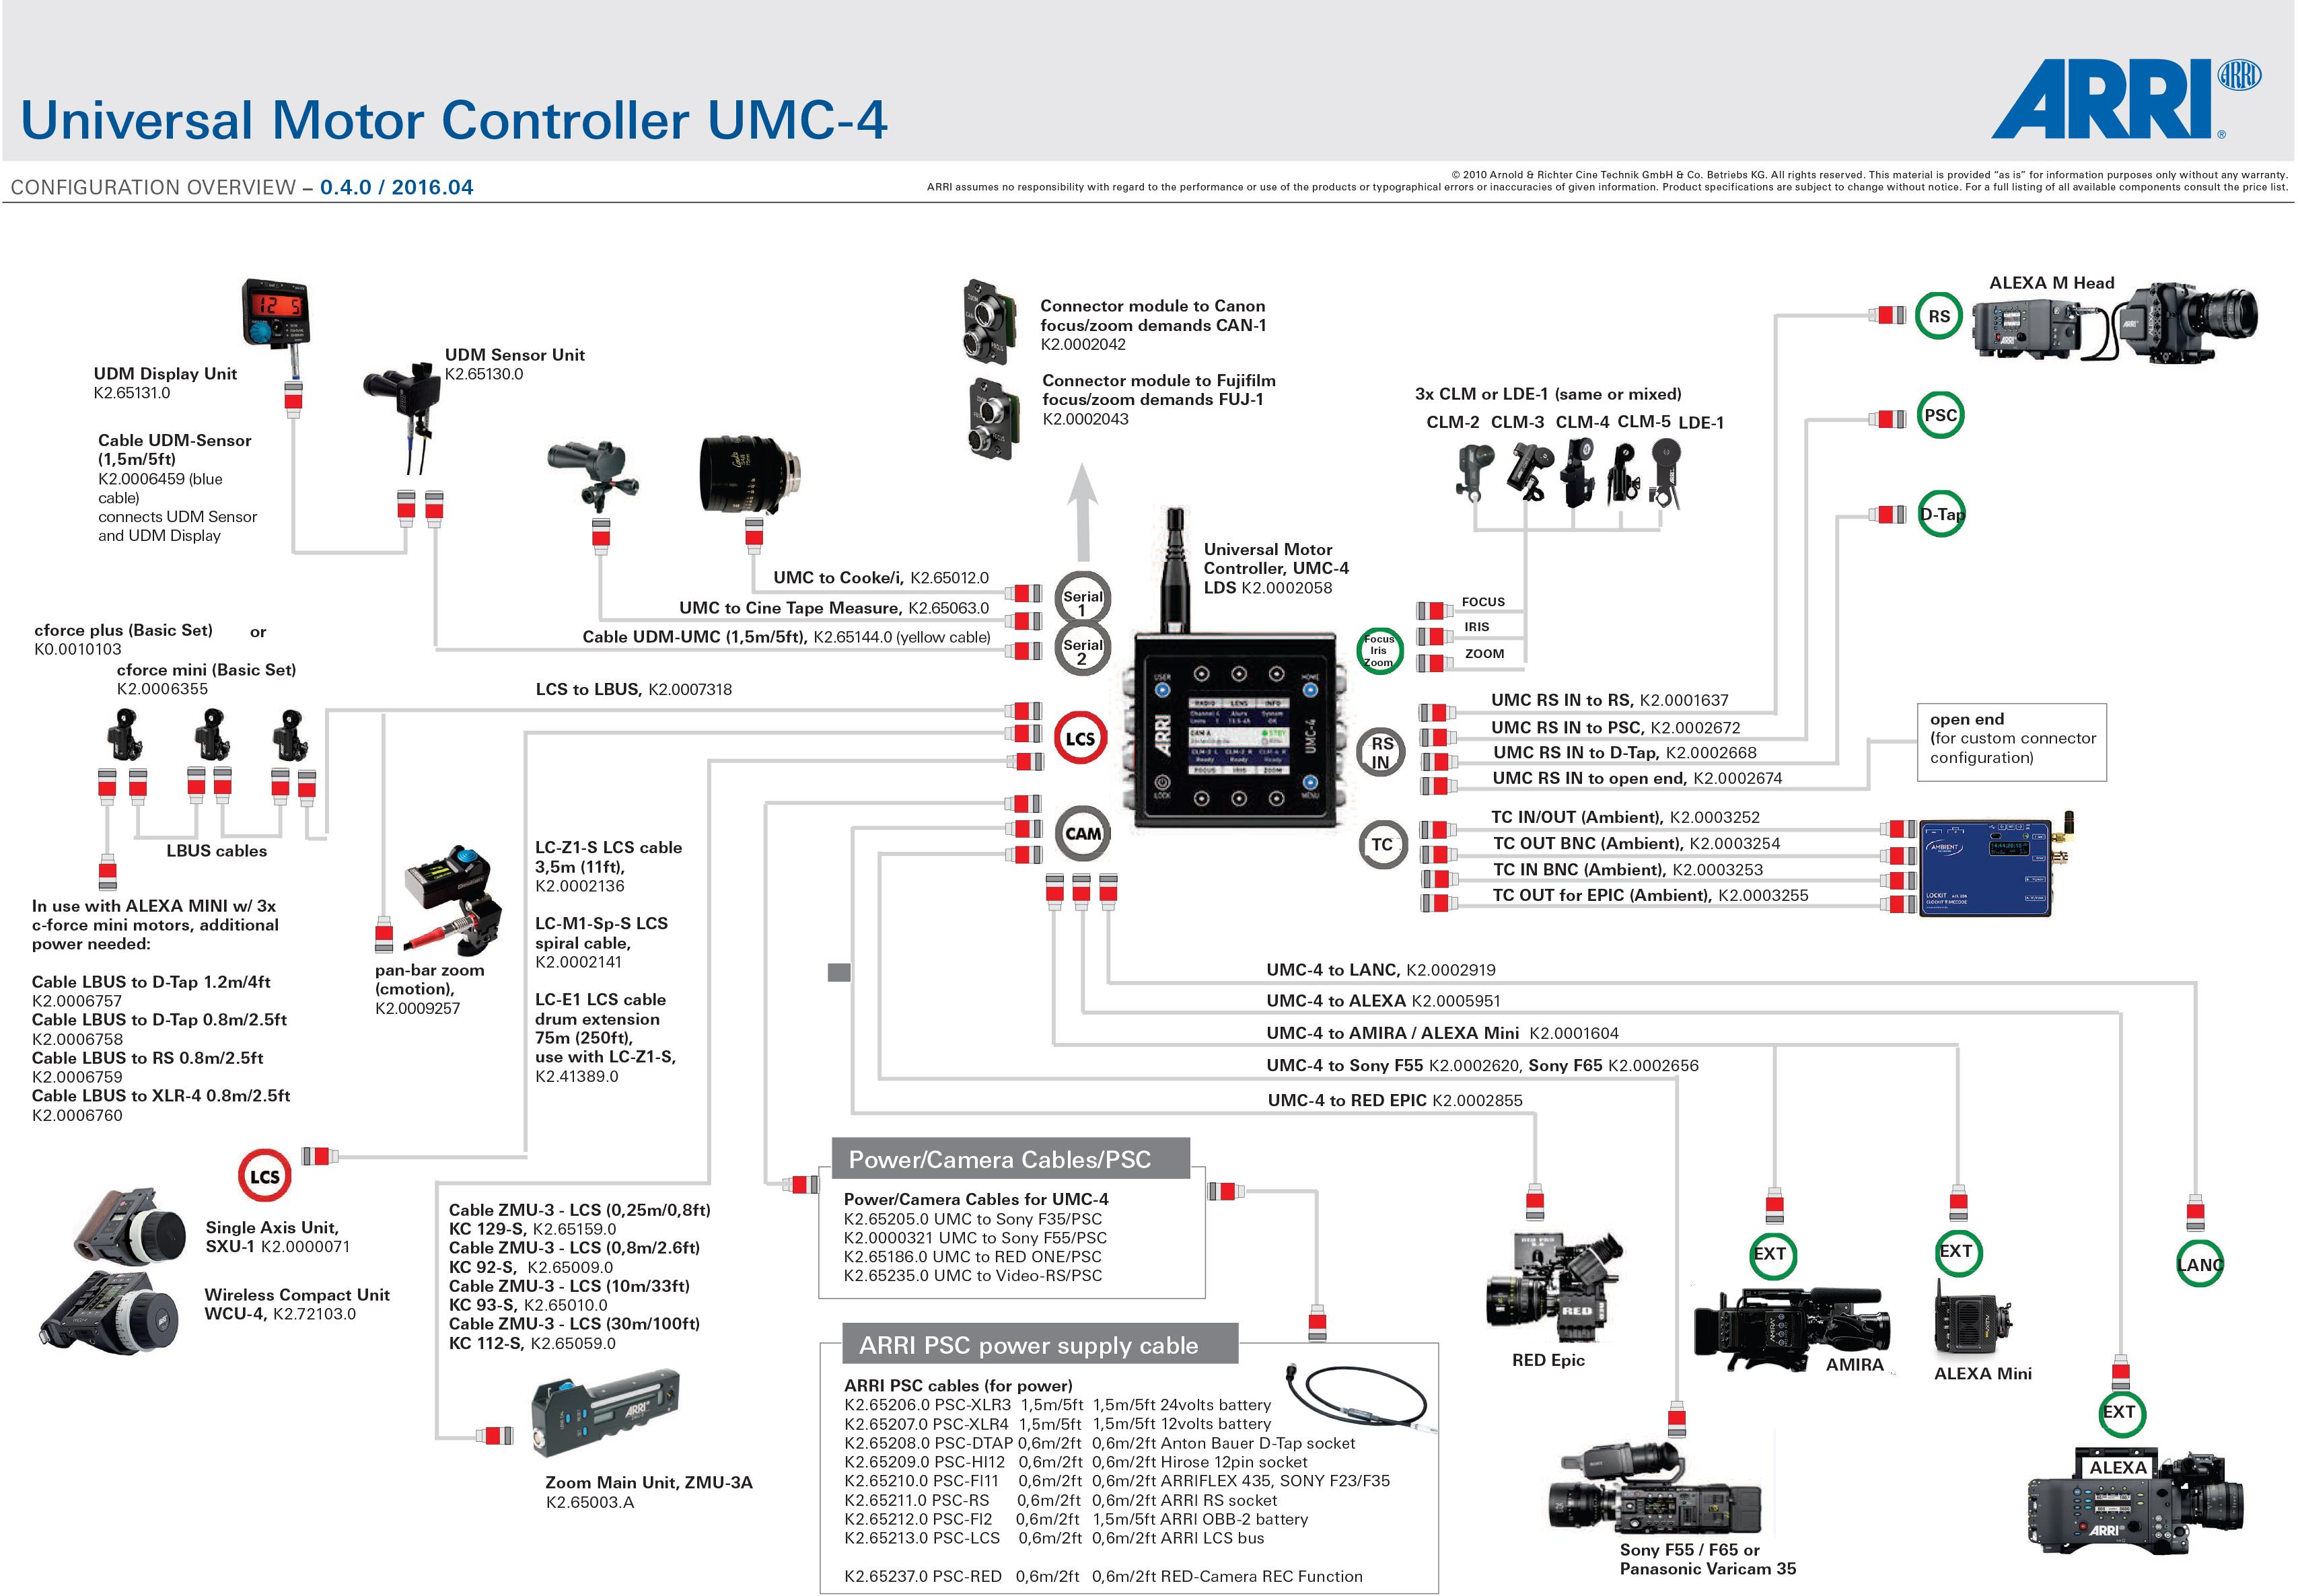 configuration overview UMC-4